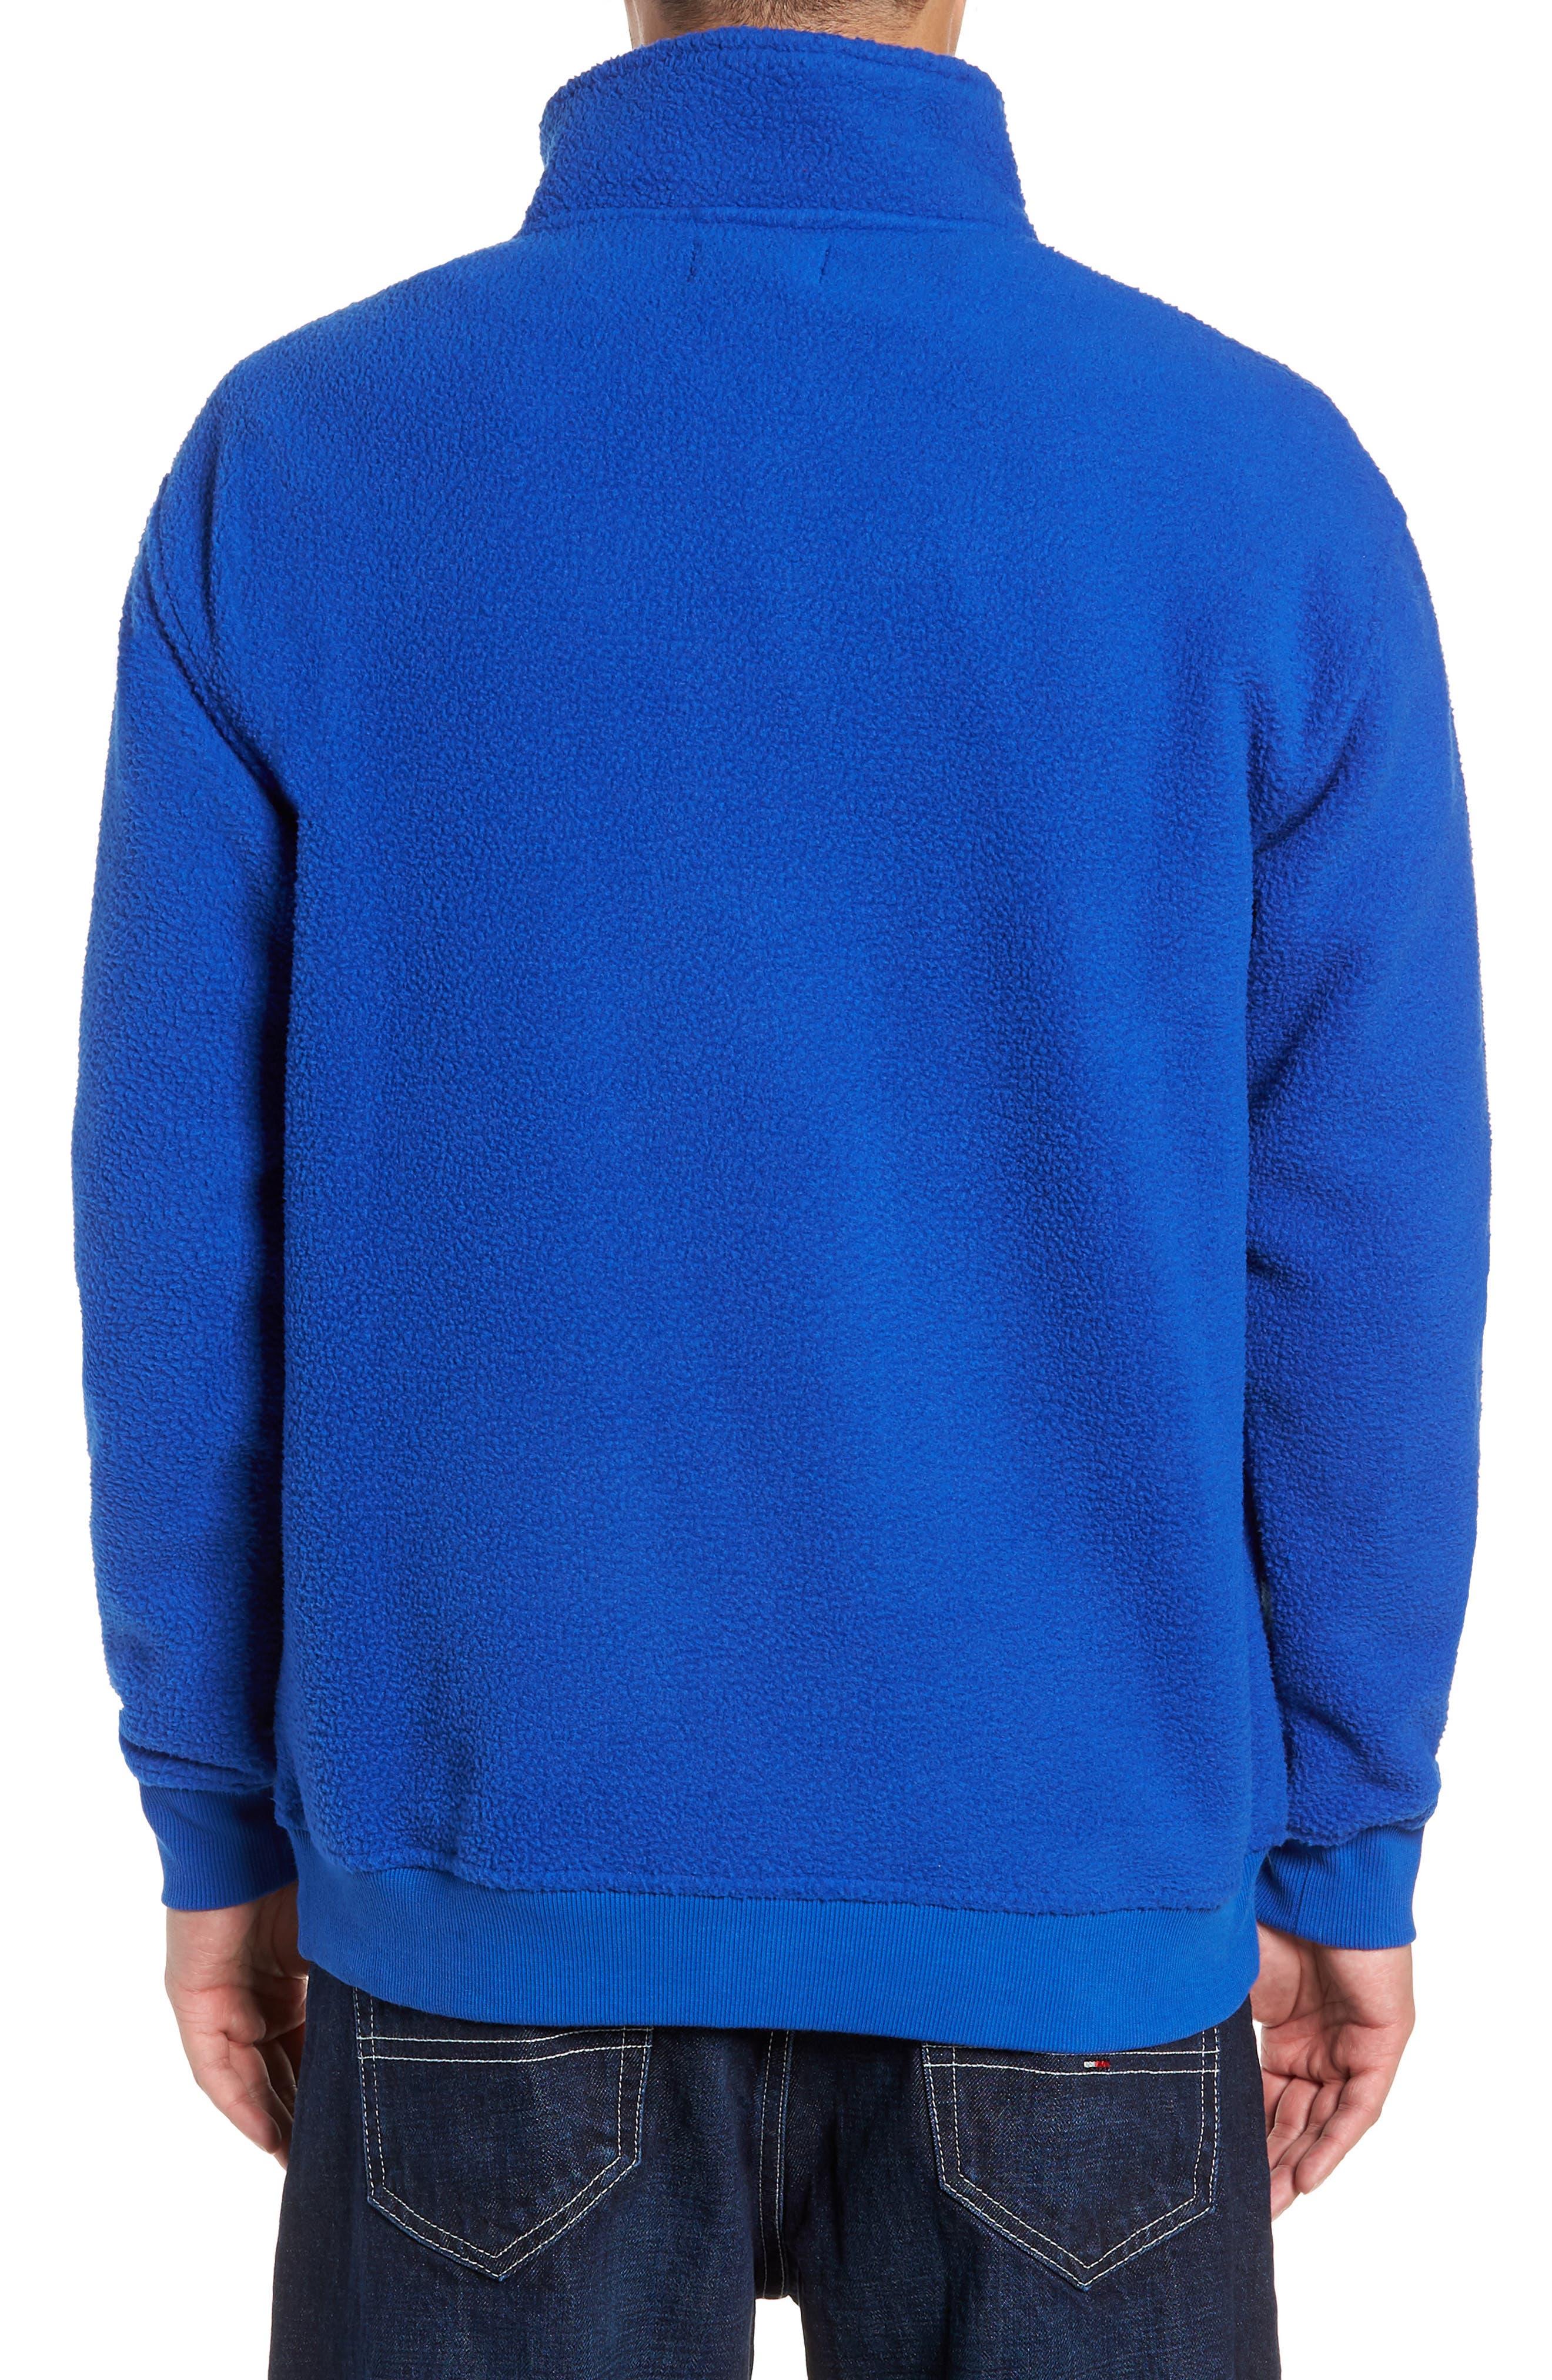 TJM Classics Half Zip Fleece Pullover,                             Alternate thumbnail 2, color,                             SURF THE WEB